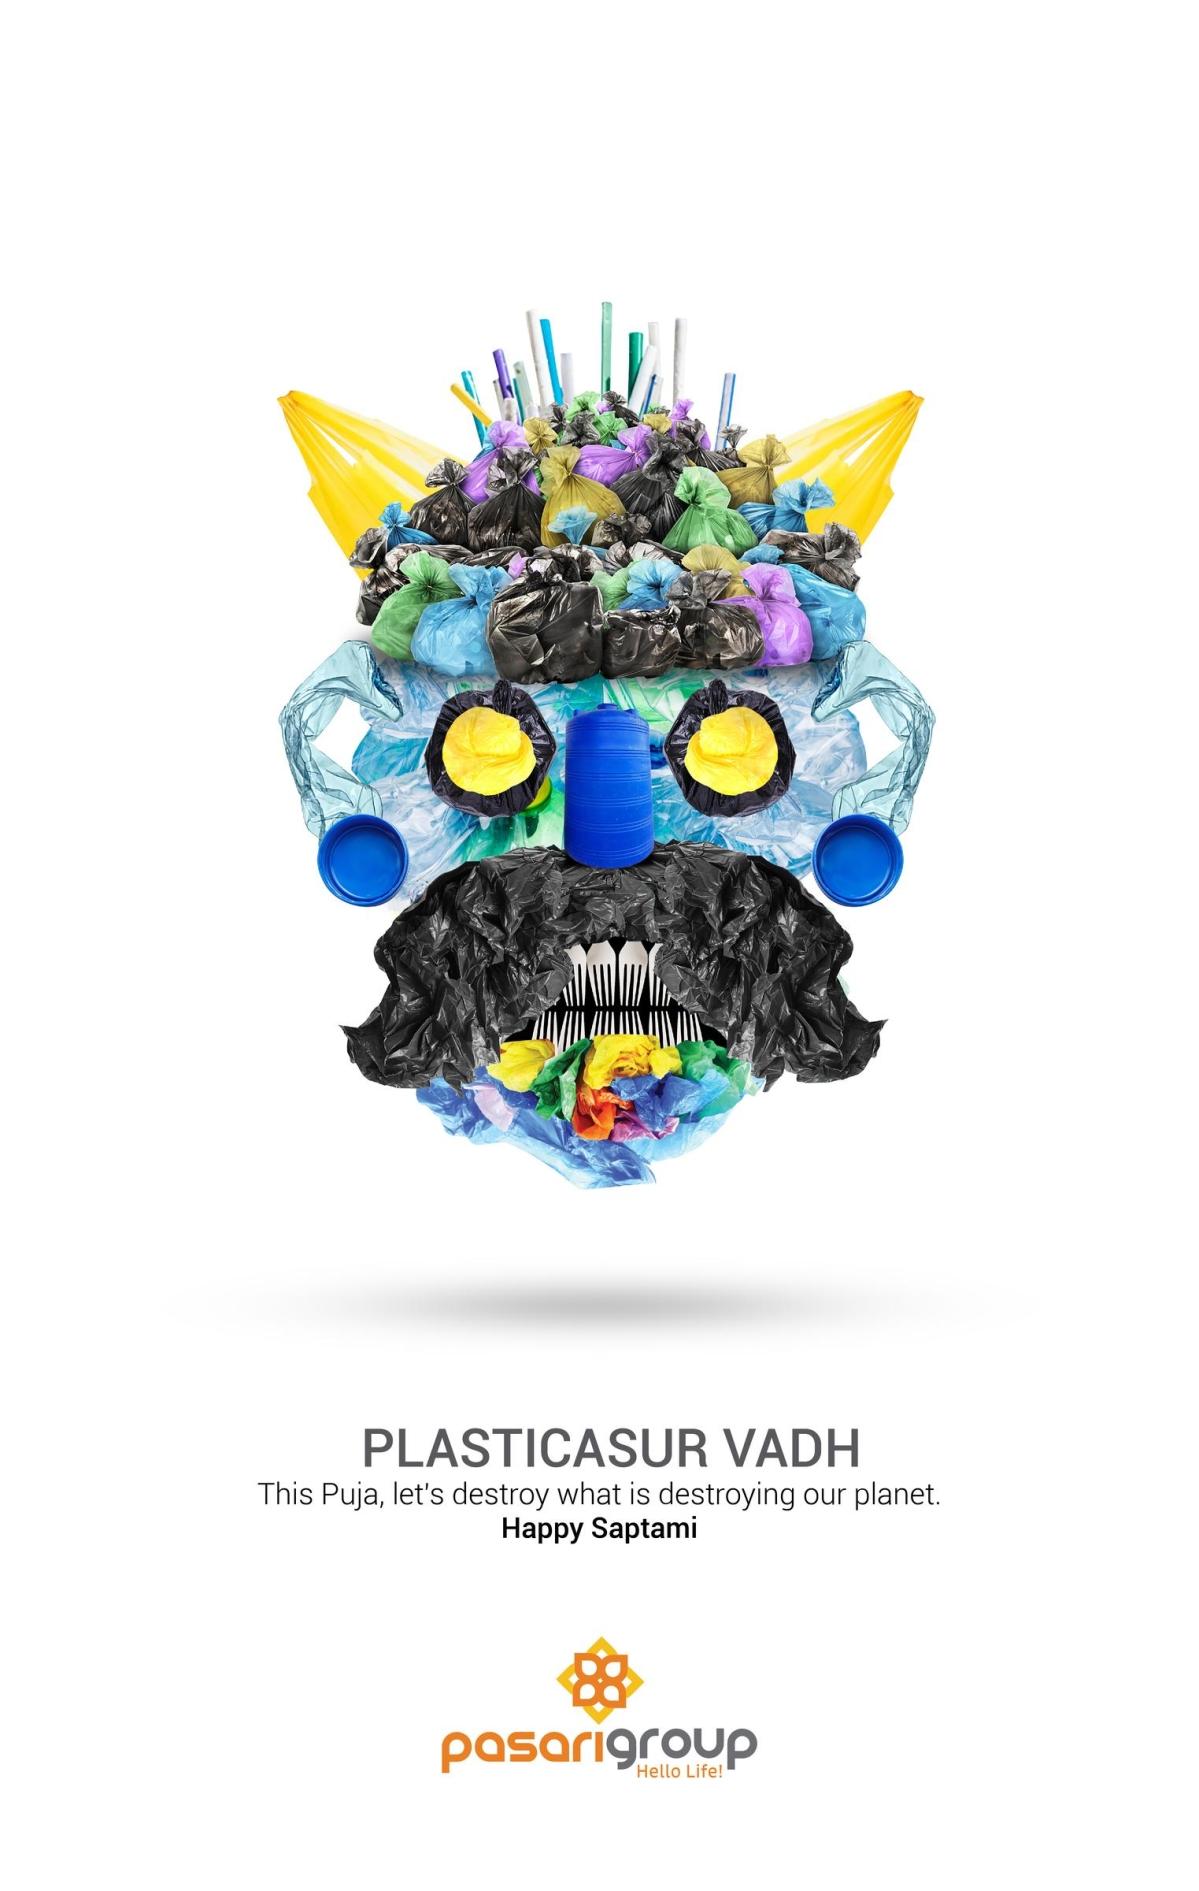 Destroy pollution in a creative way